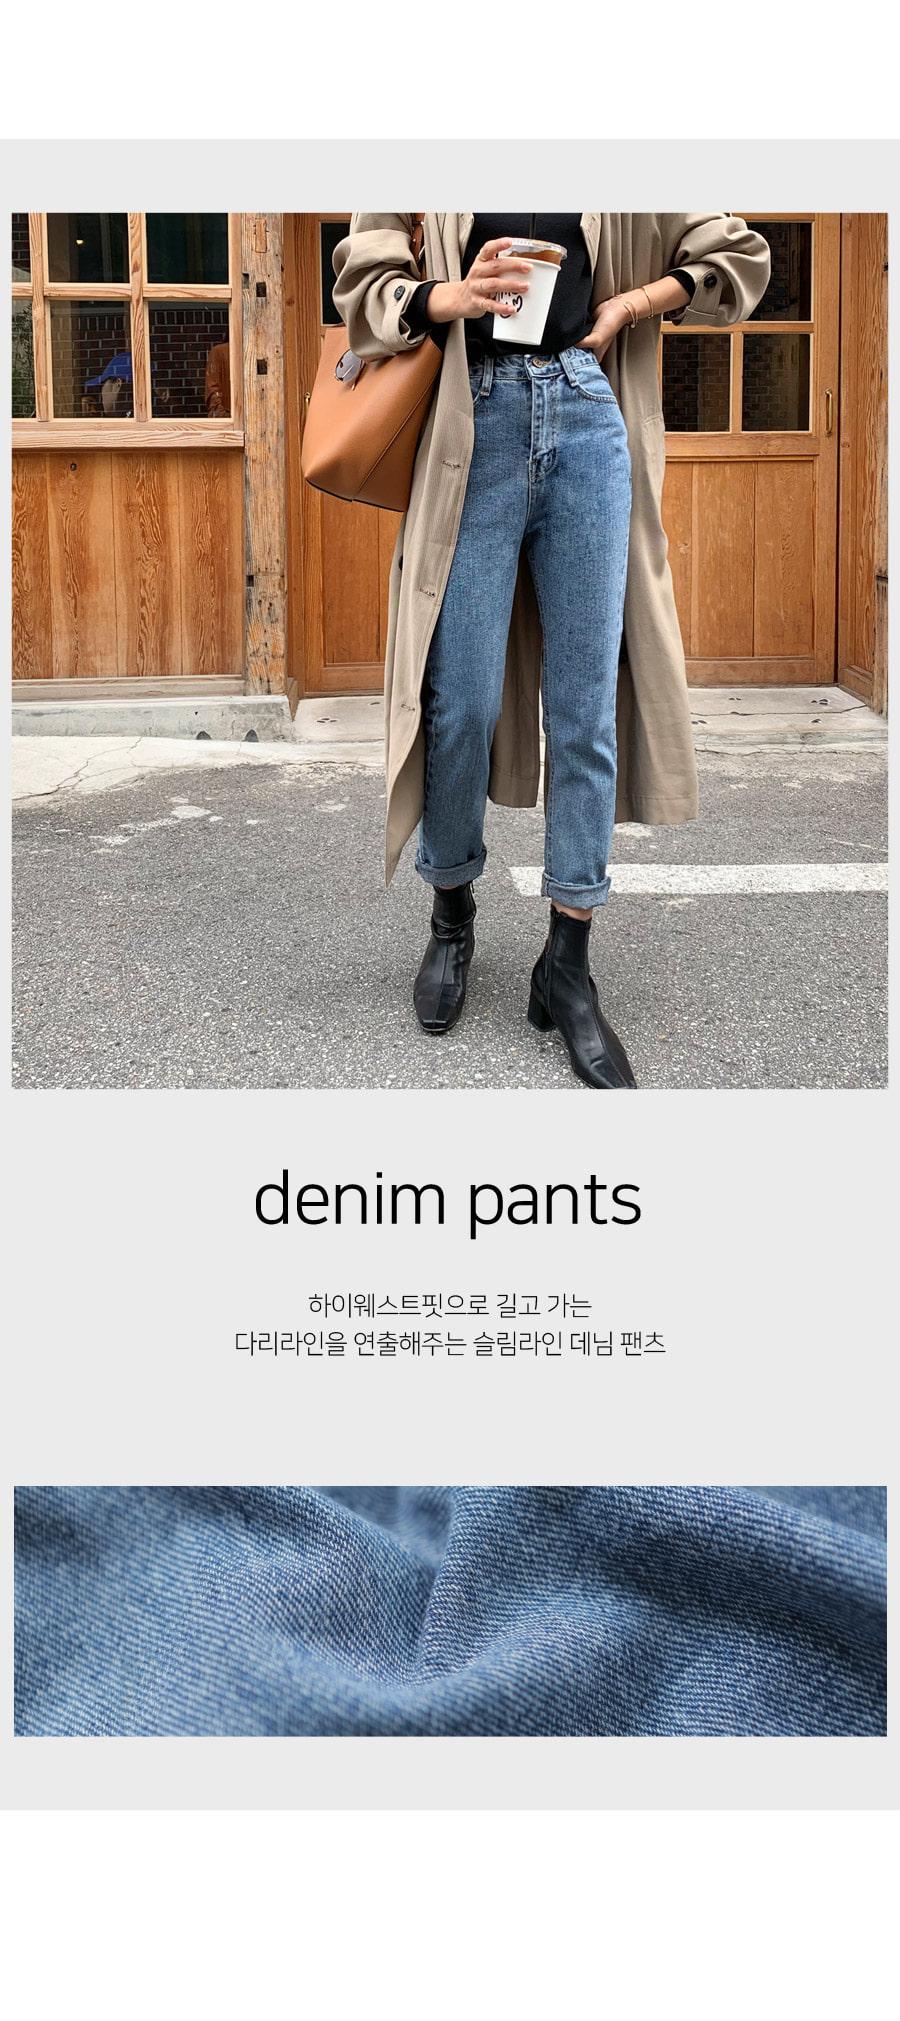 Modine high-up denim pants